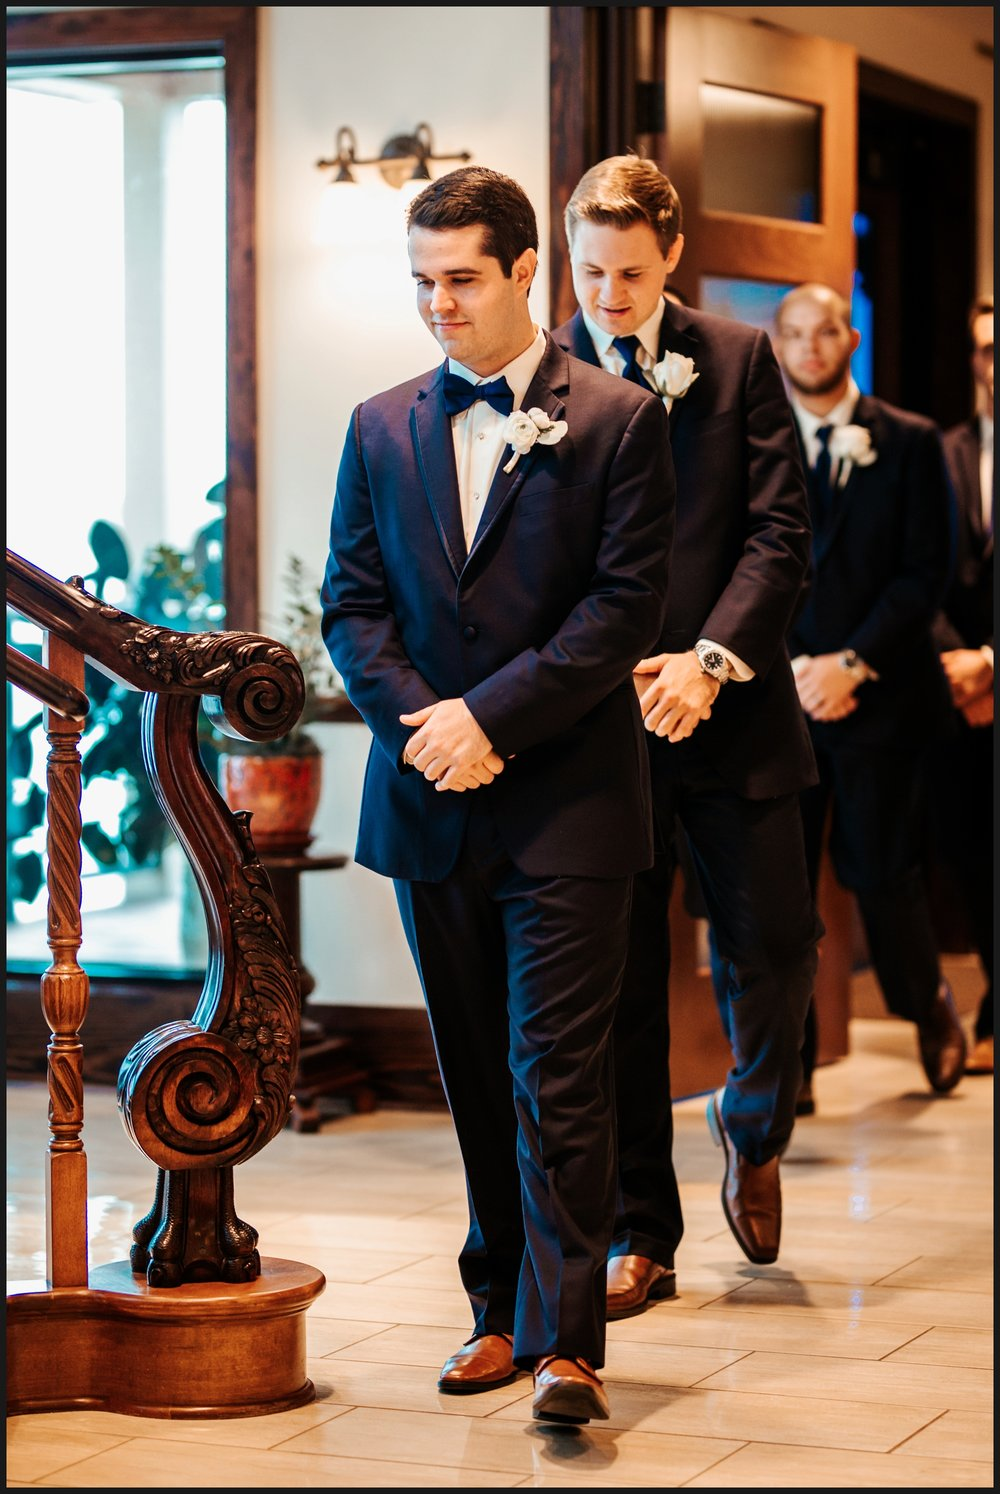 Orlando-Wedding-Photographer-destination-wedding-photographer-florida-wedding-photographer-bohemian-wedding-photographer_0270.jpg